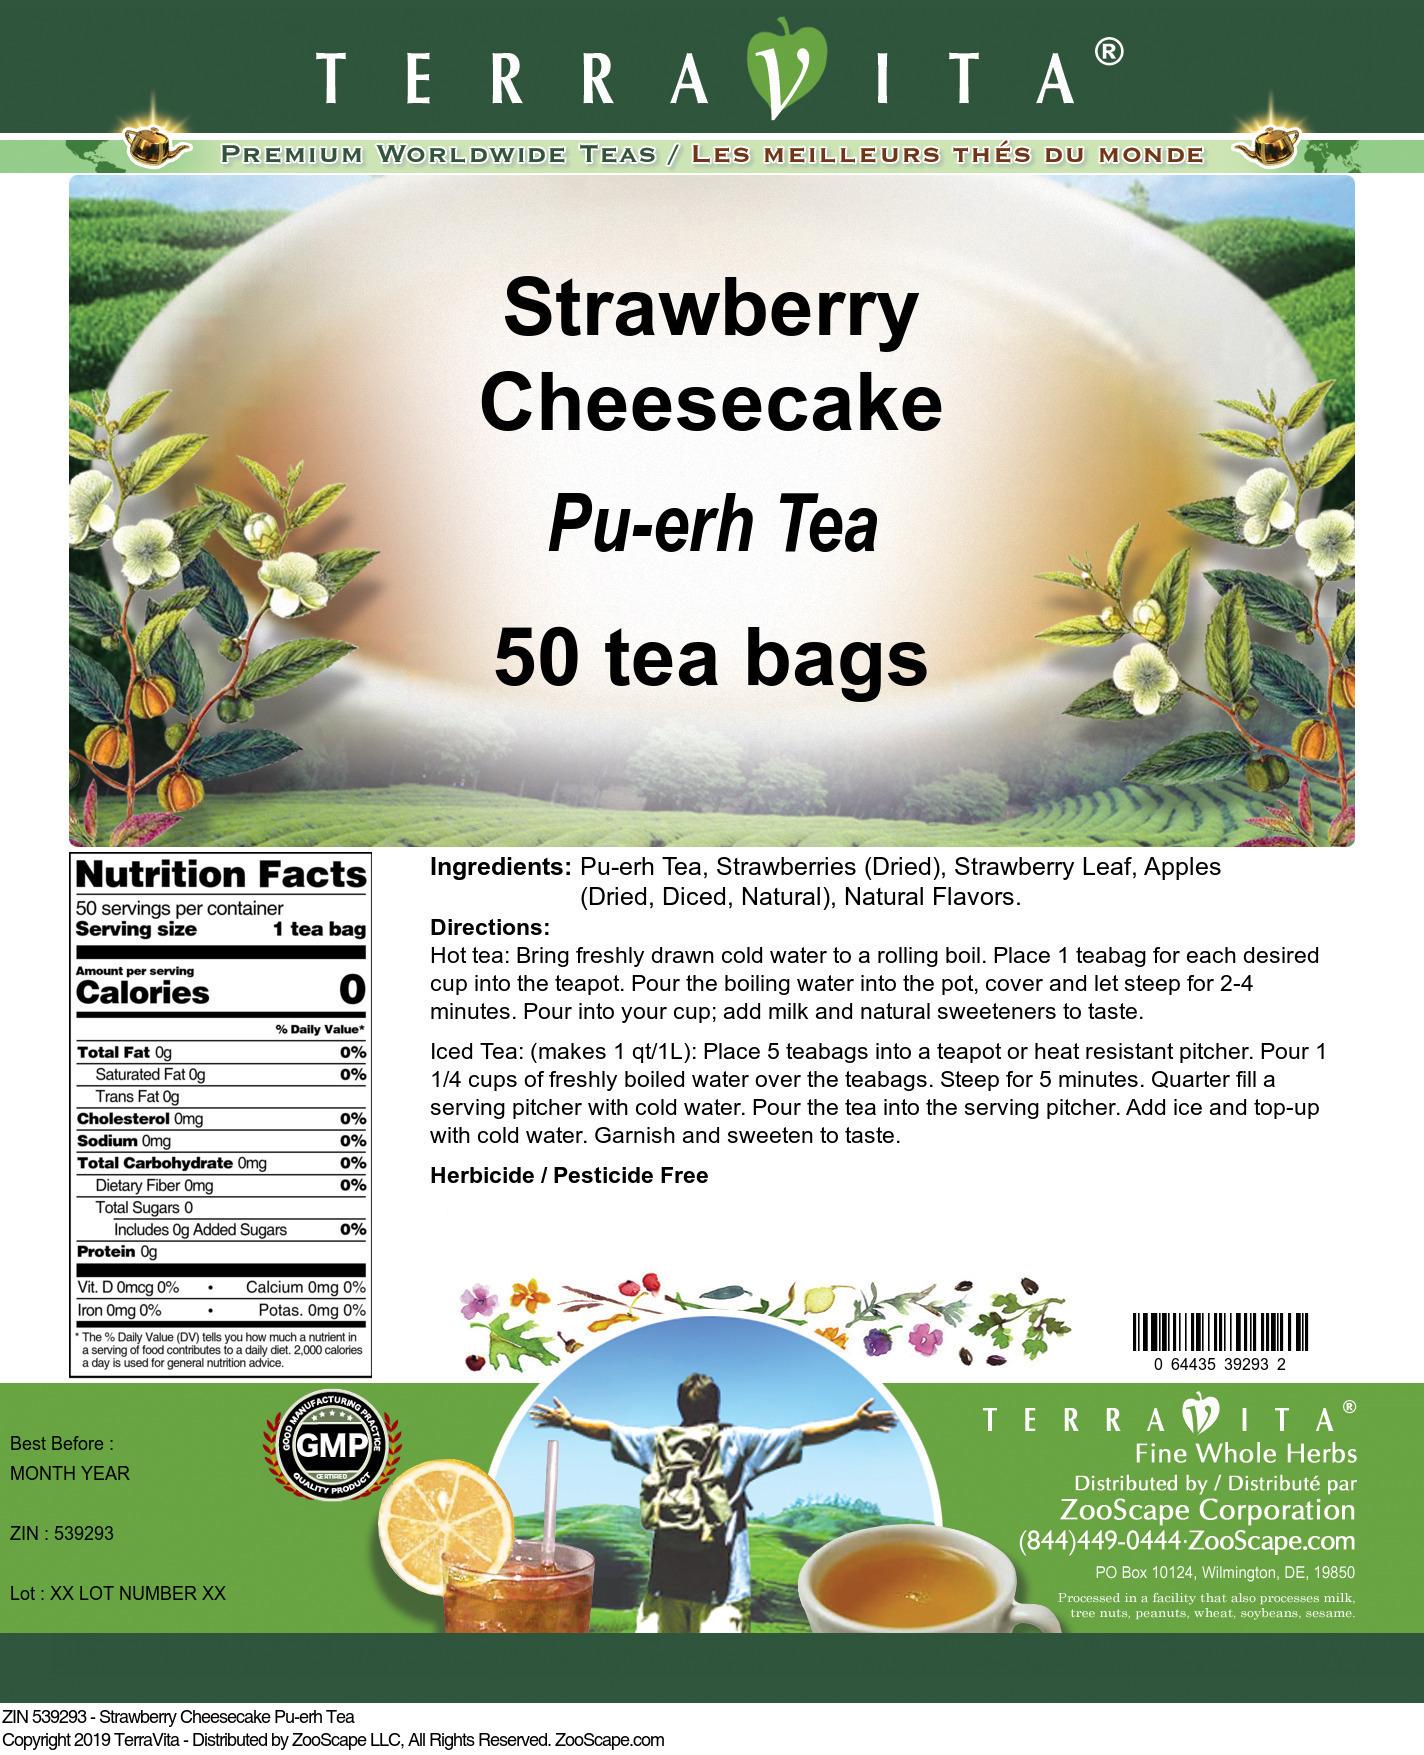 Strawberry Cheesecake Pu-erh Tea